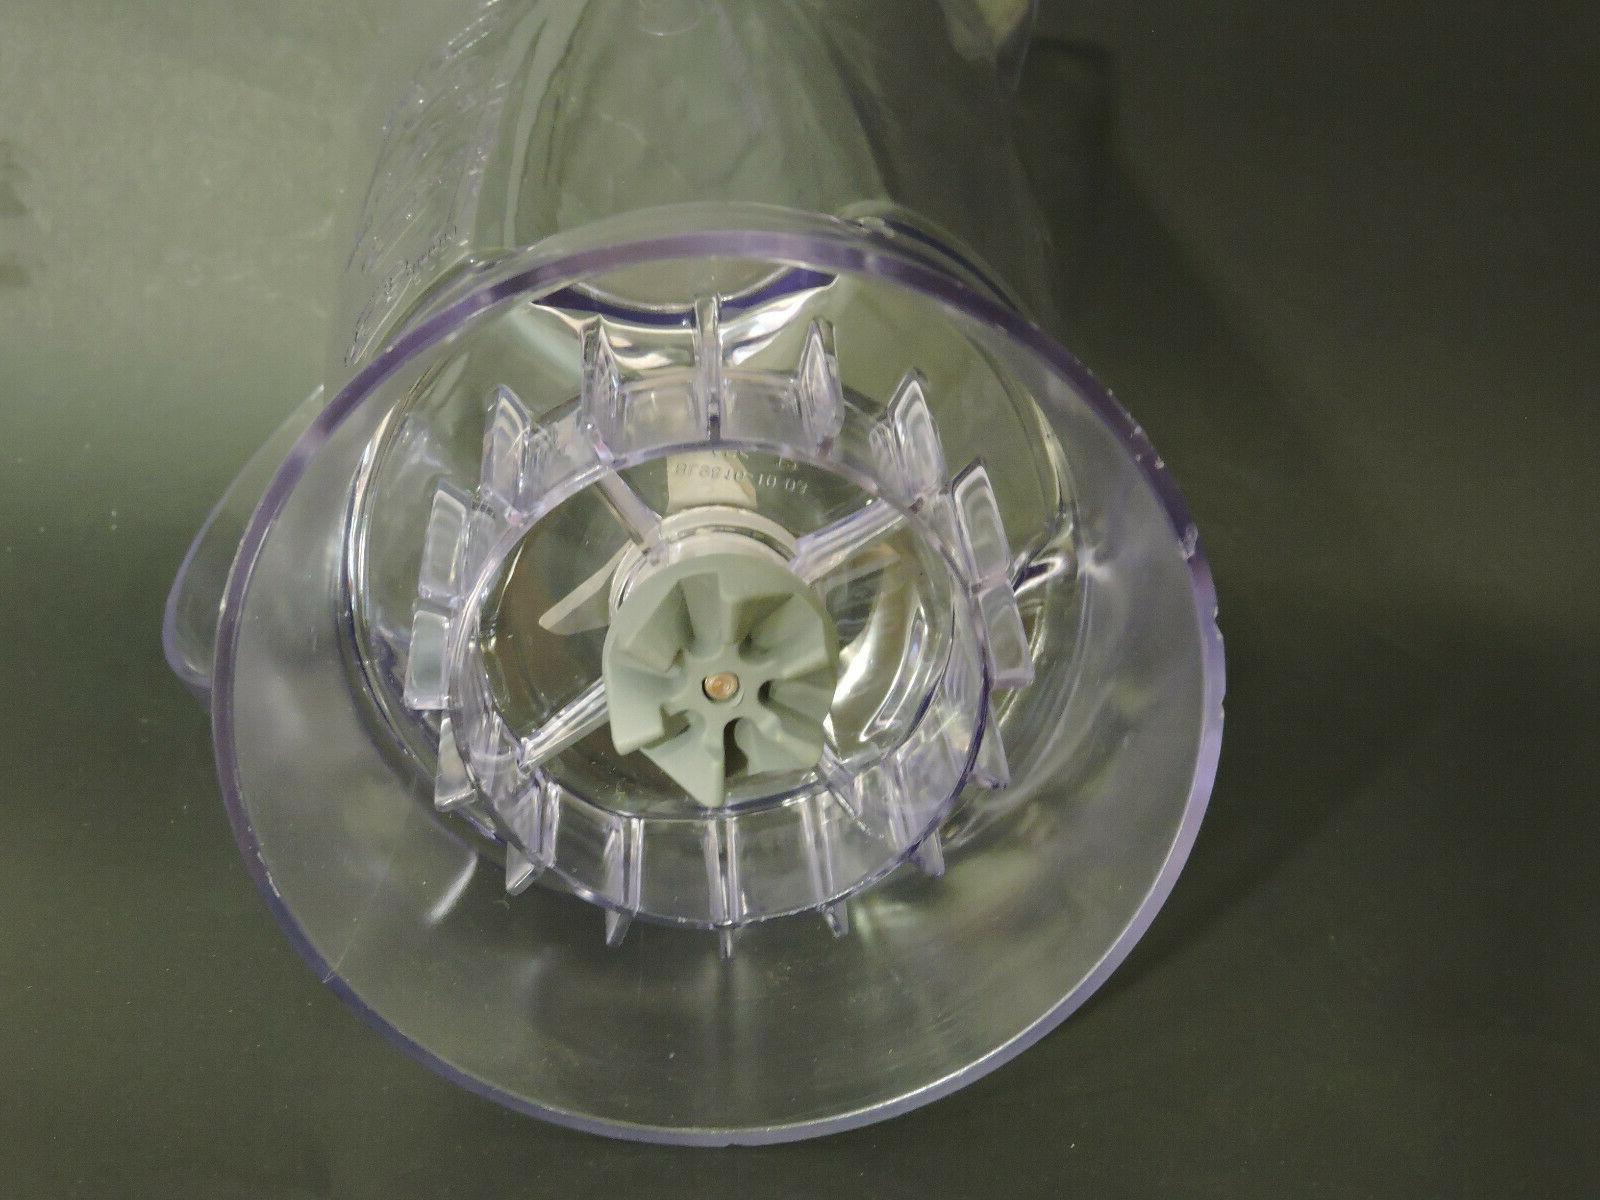 Proctor Durable 56 Jar 58137